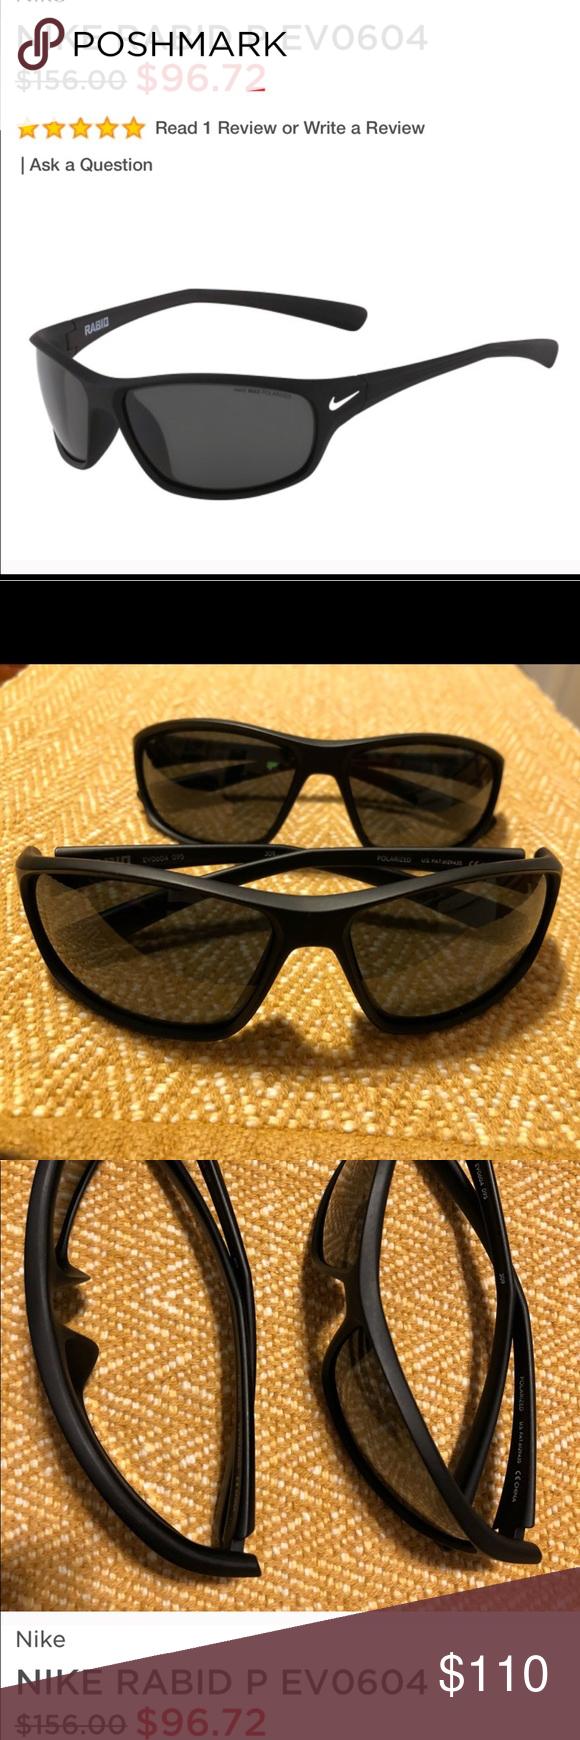 32346feba66b NIKE SUNGLASSES 🕶 SET OF 2 like new! POLARIZED Nike Rabid EV 0604 Original  price $156 each Color matte black polarized lens No case Excellent  condition ...